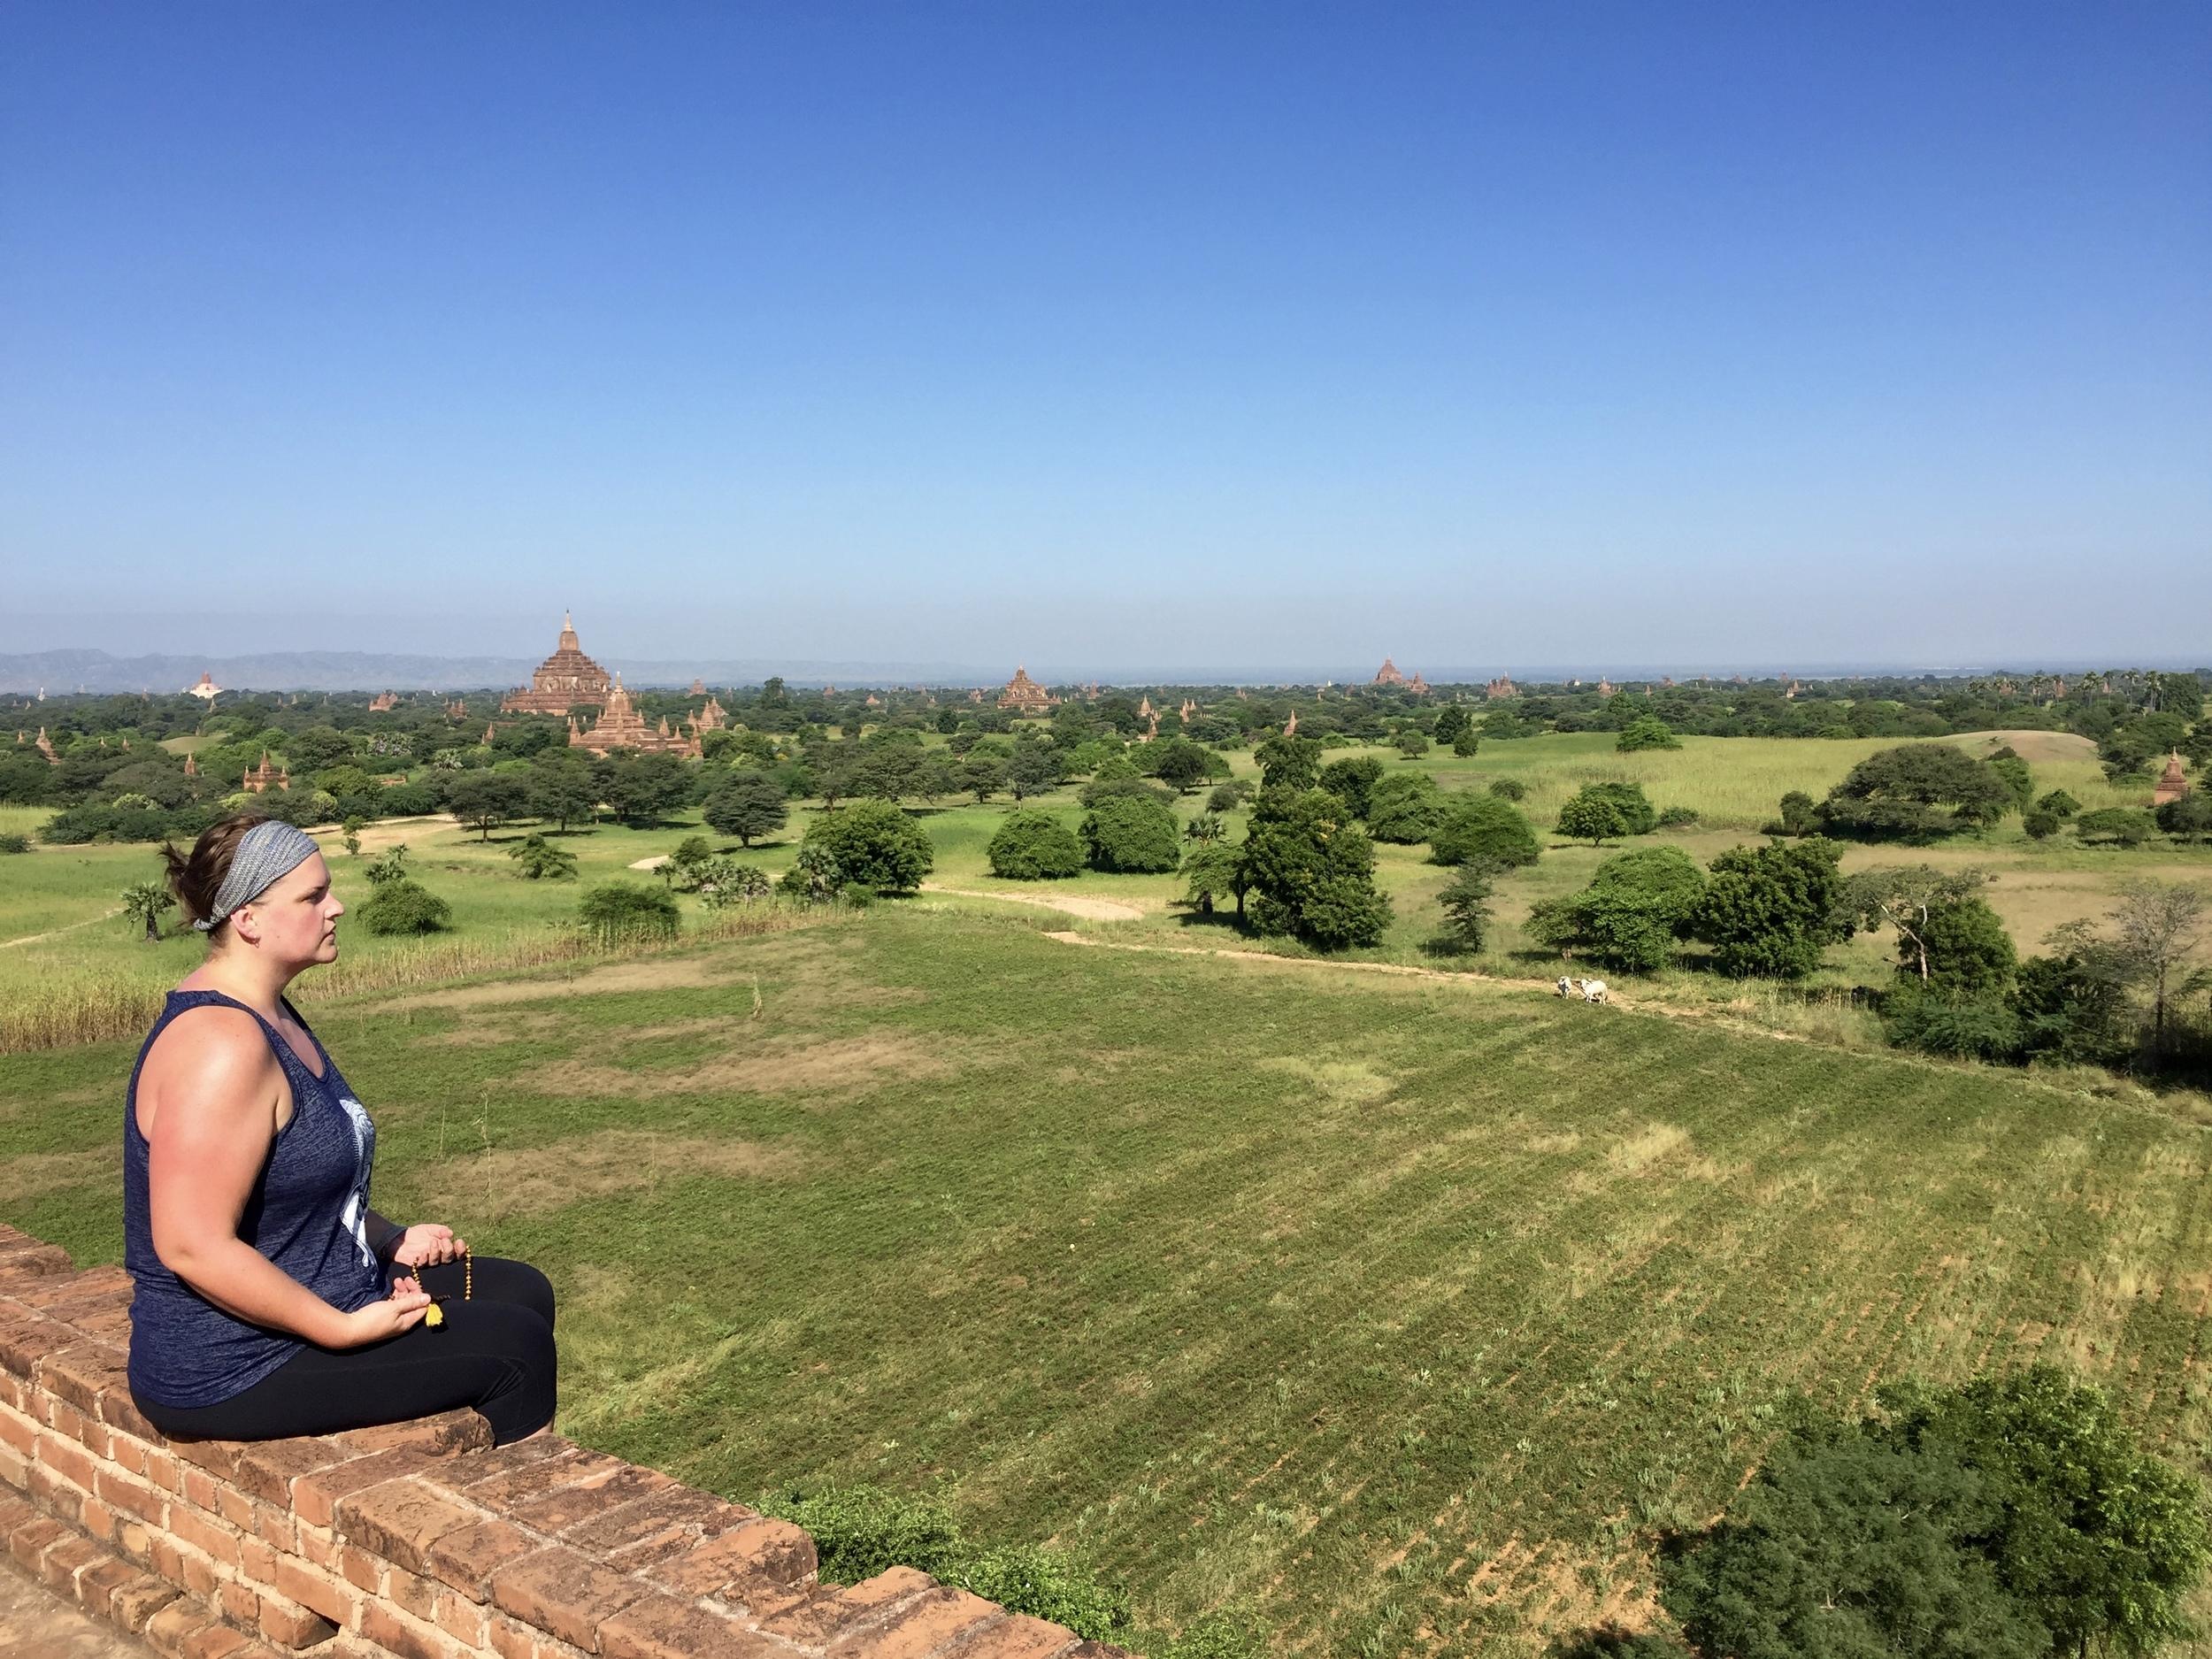 Taking in the view in Bagan, Myanmar. © 2015 Gail Jessen